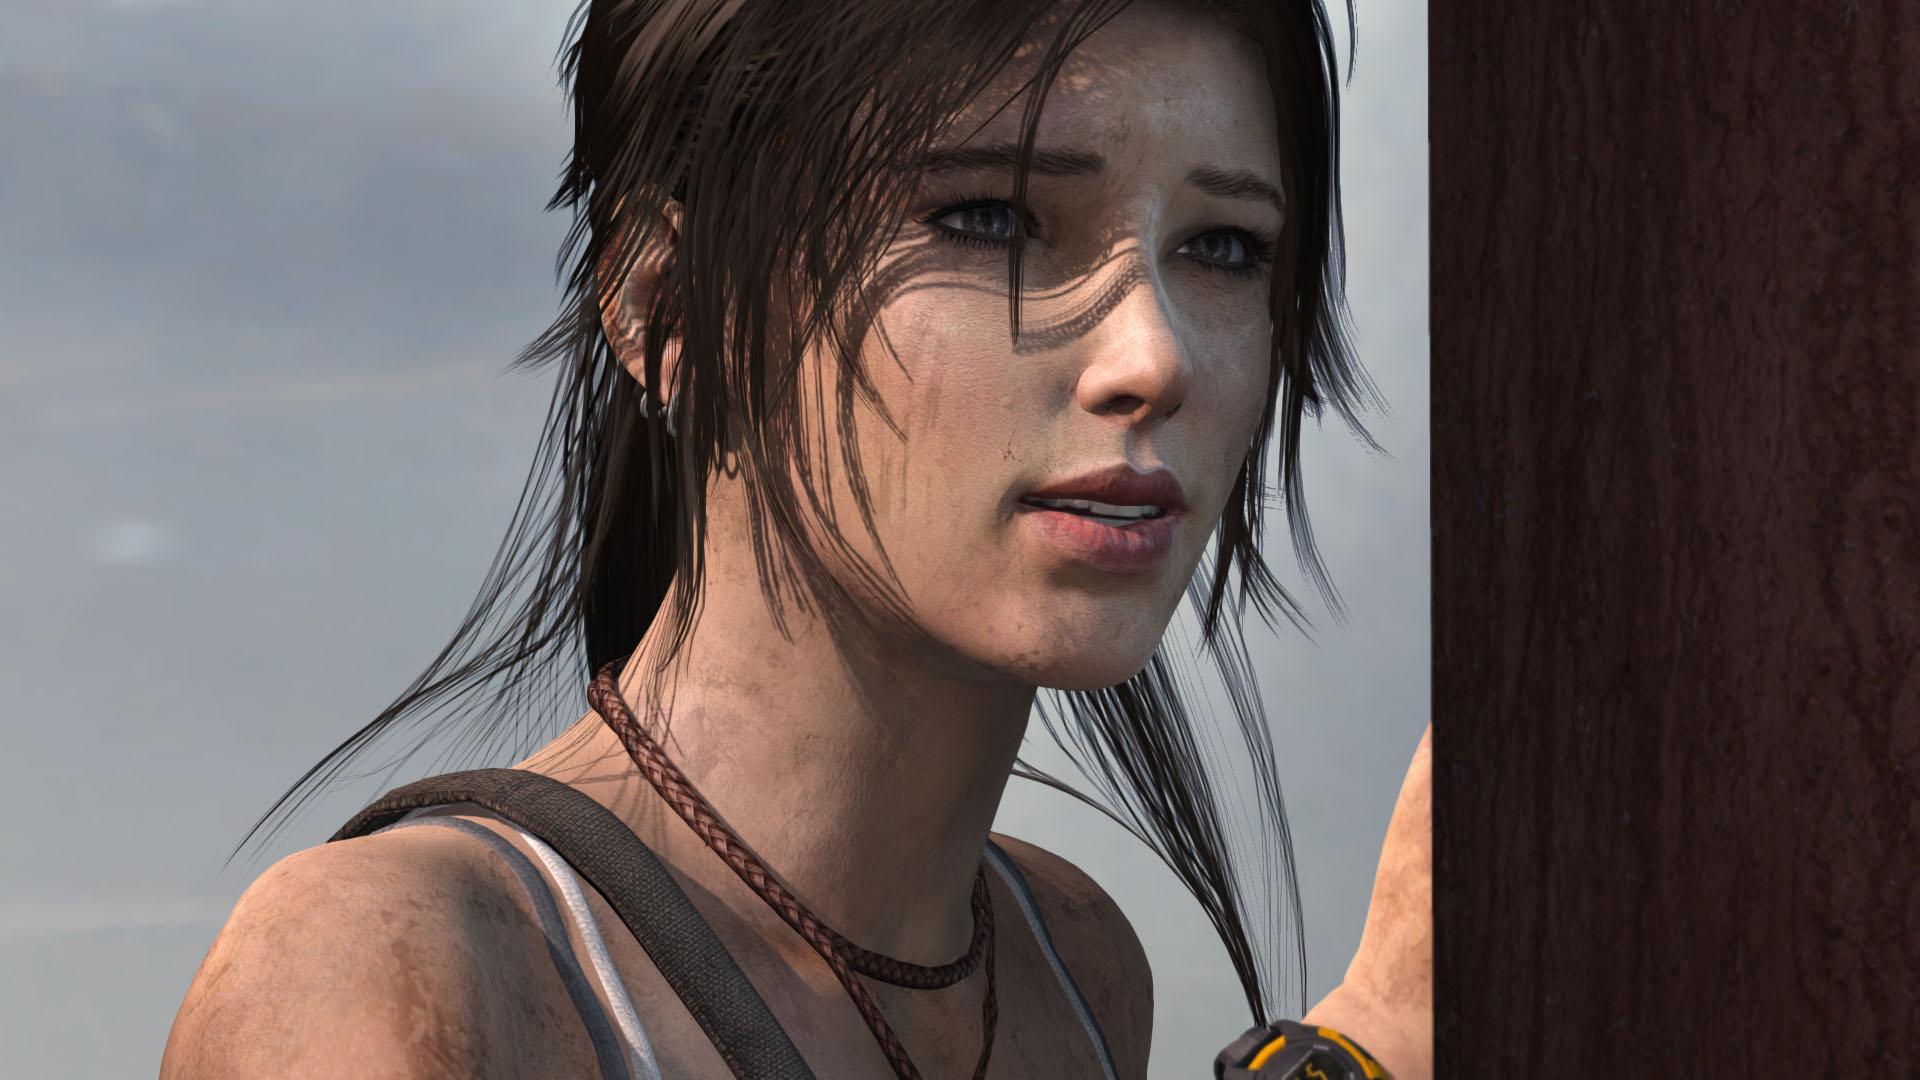 Lara croft hair naked movies